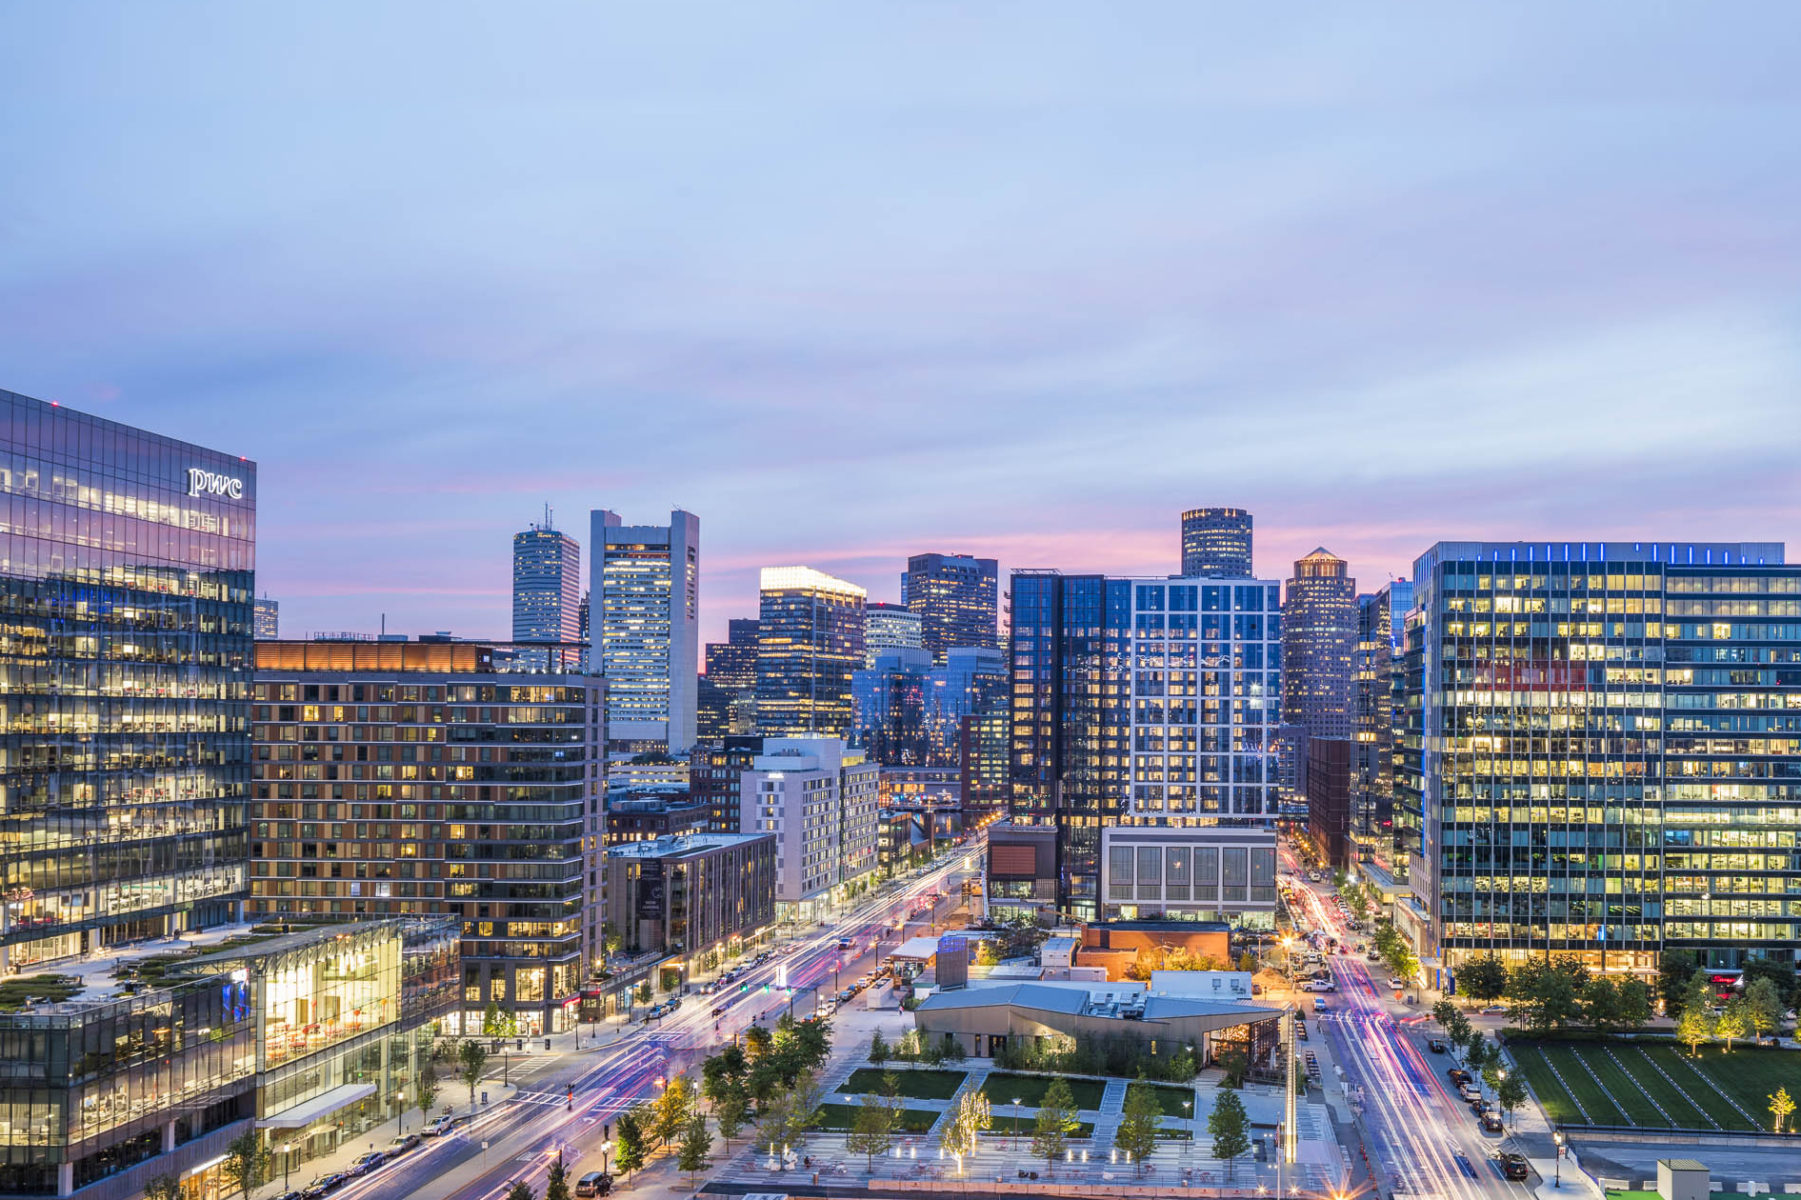 boston seaport ws development